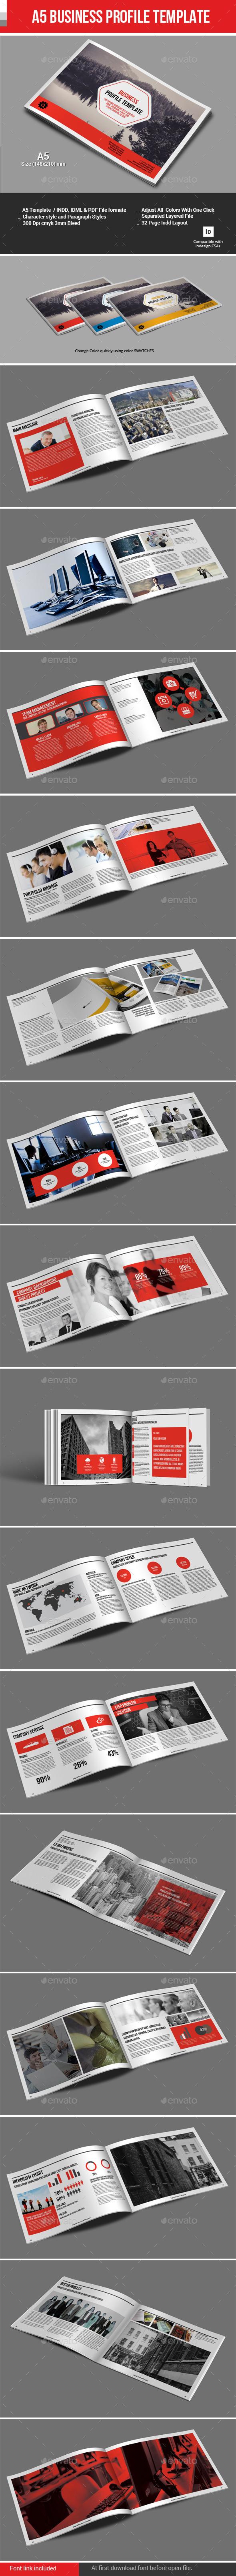 A5 Business Profile Template - Corporate Brochures